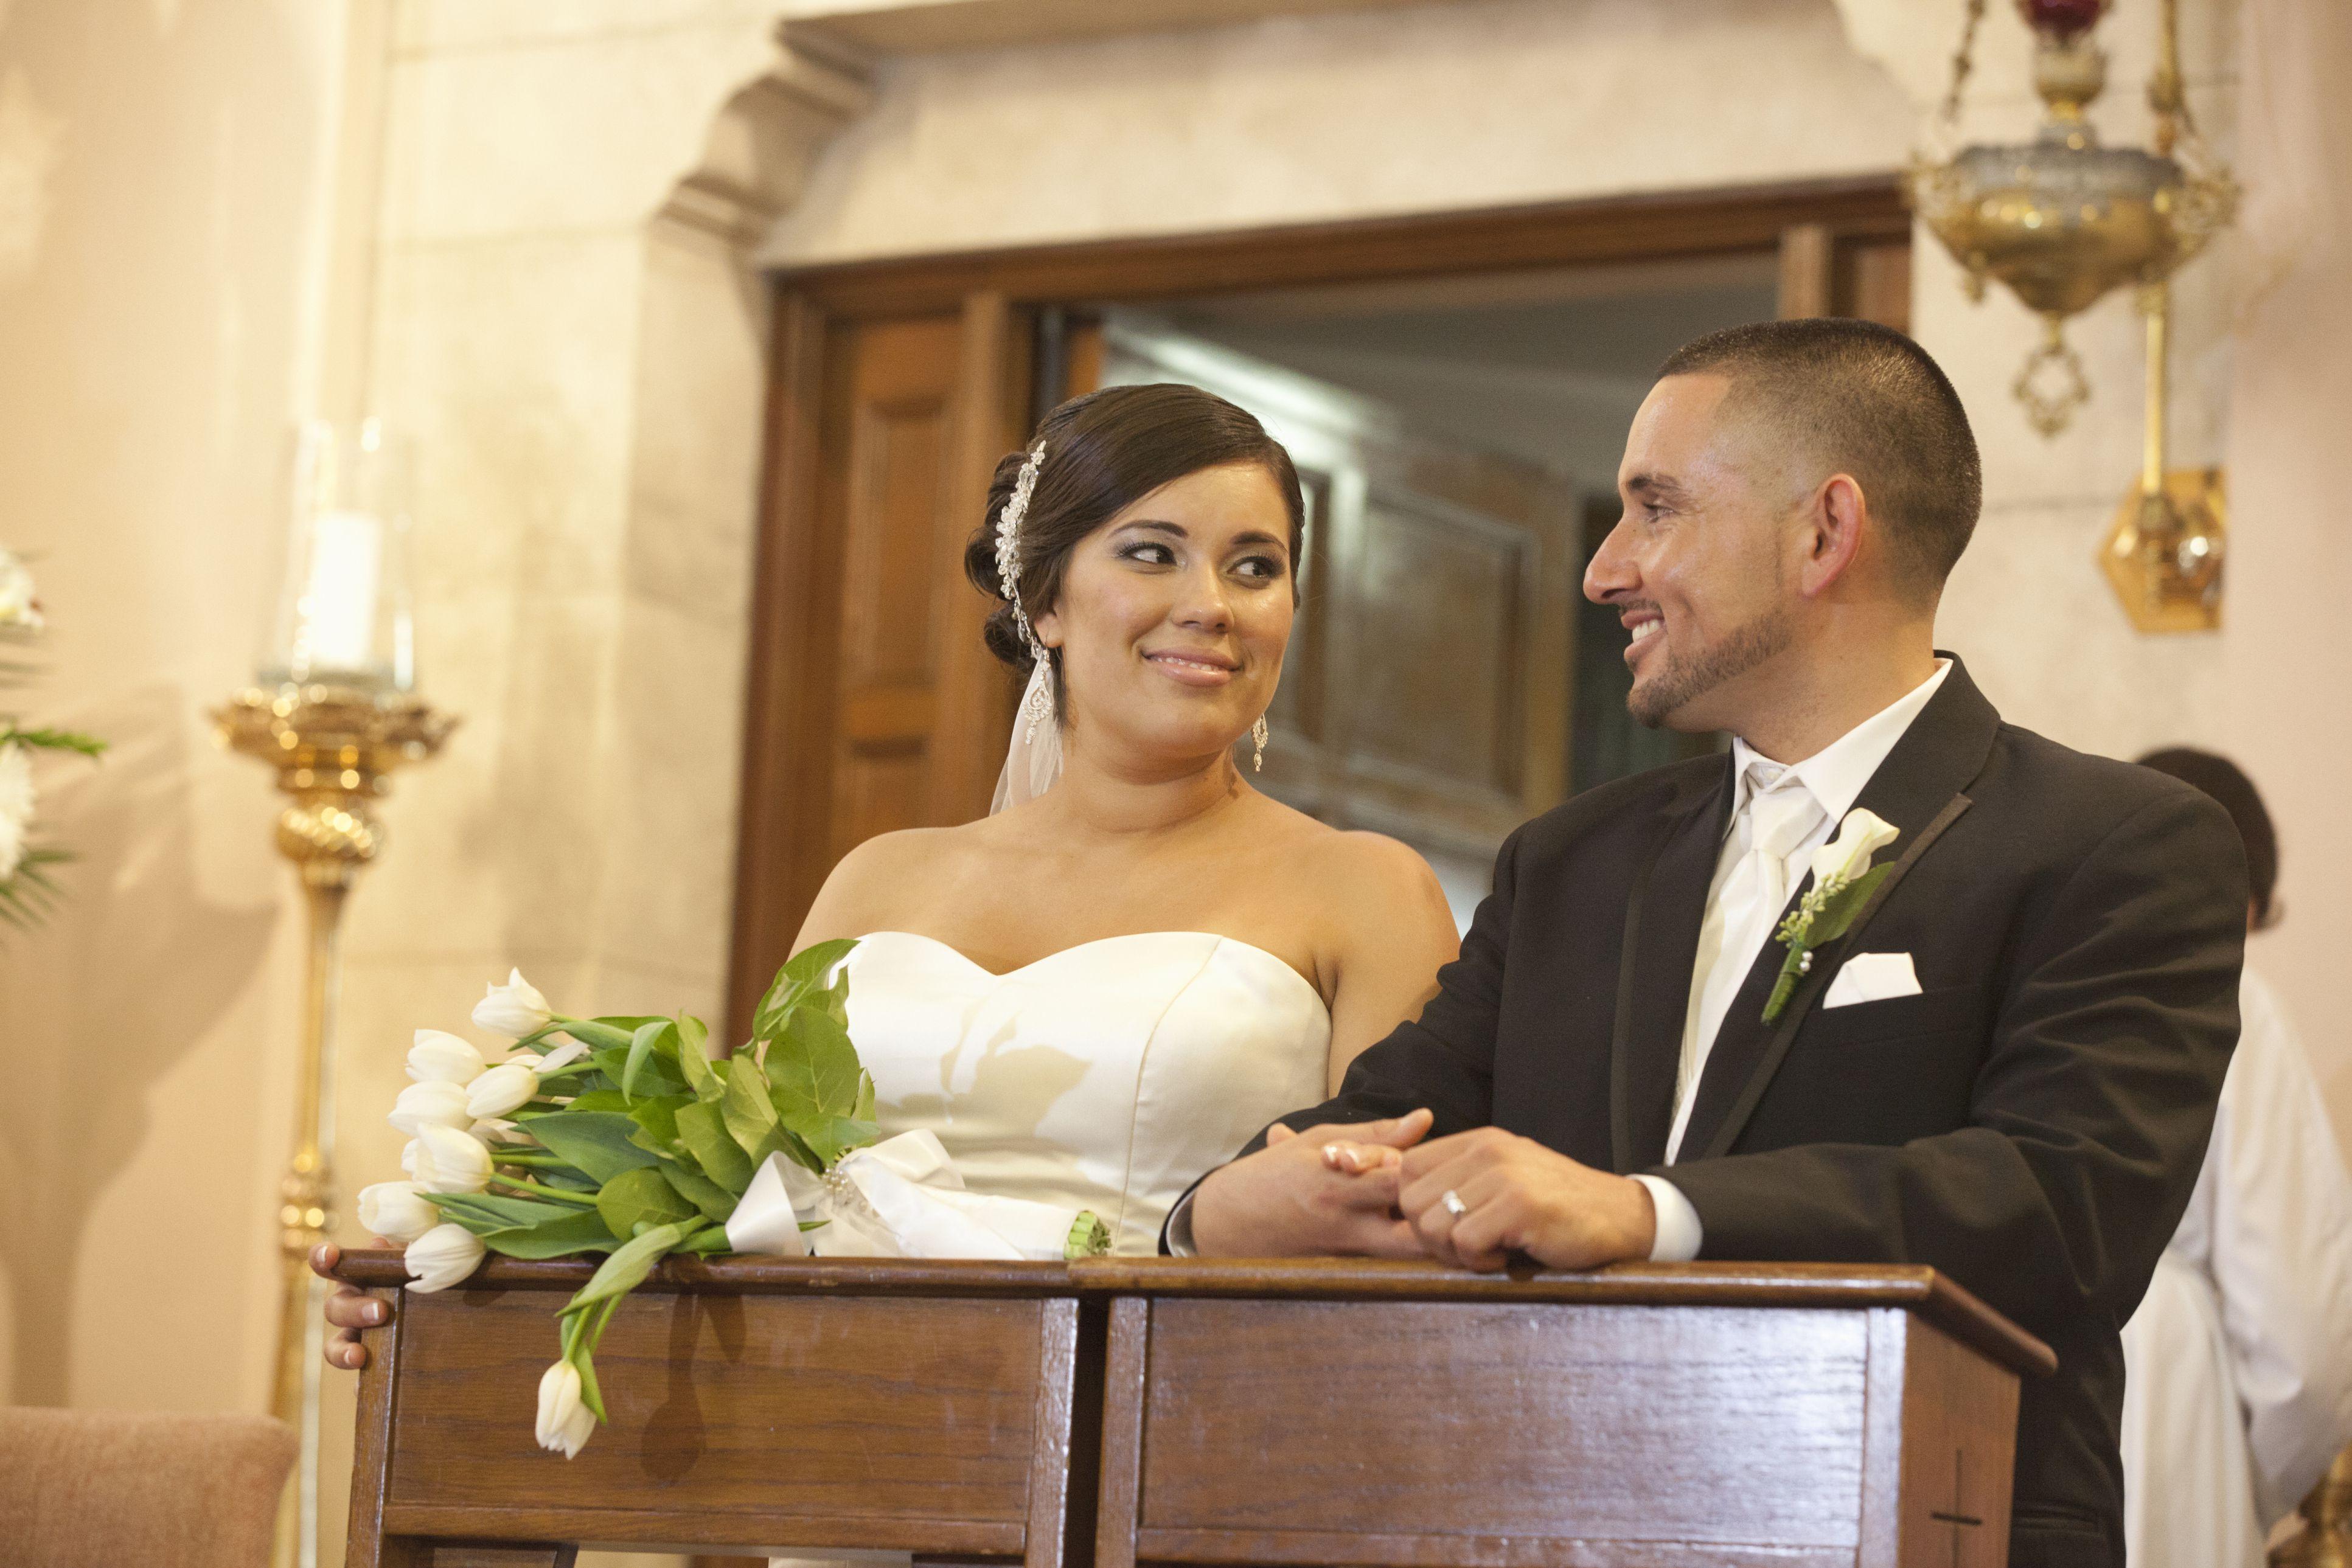 Matrimonio Catolico Sin Fiesta : Rito del matrimonio ceremonia de católico